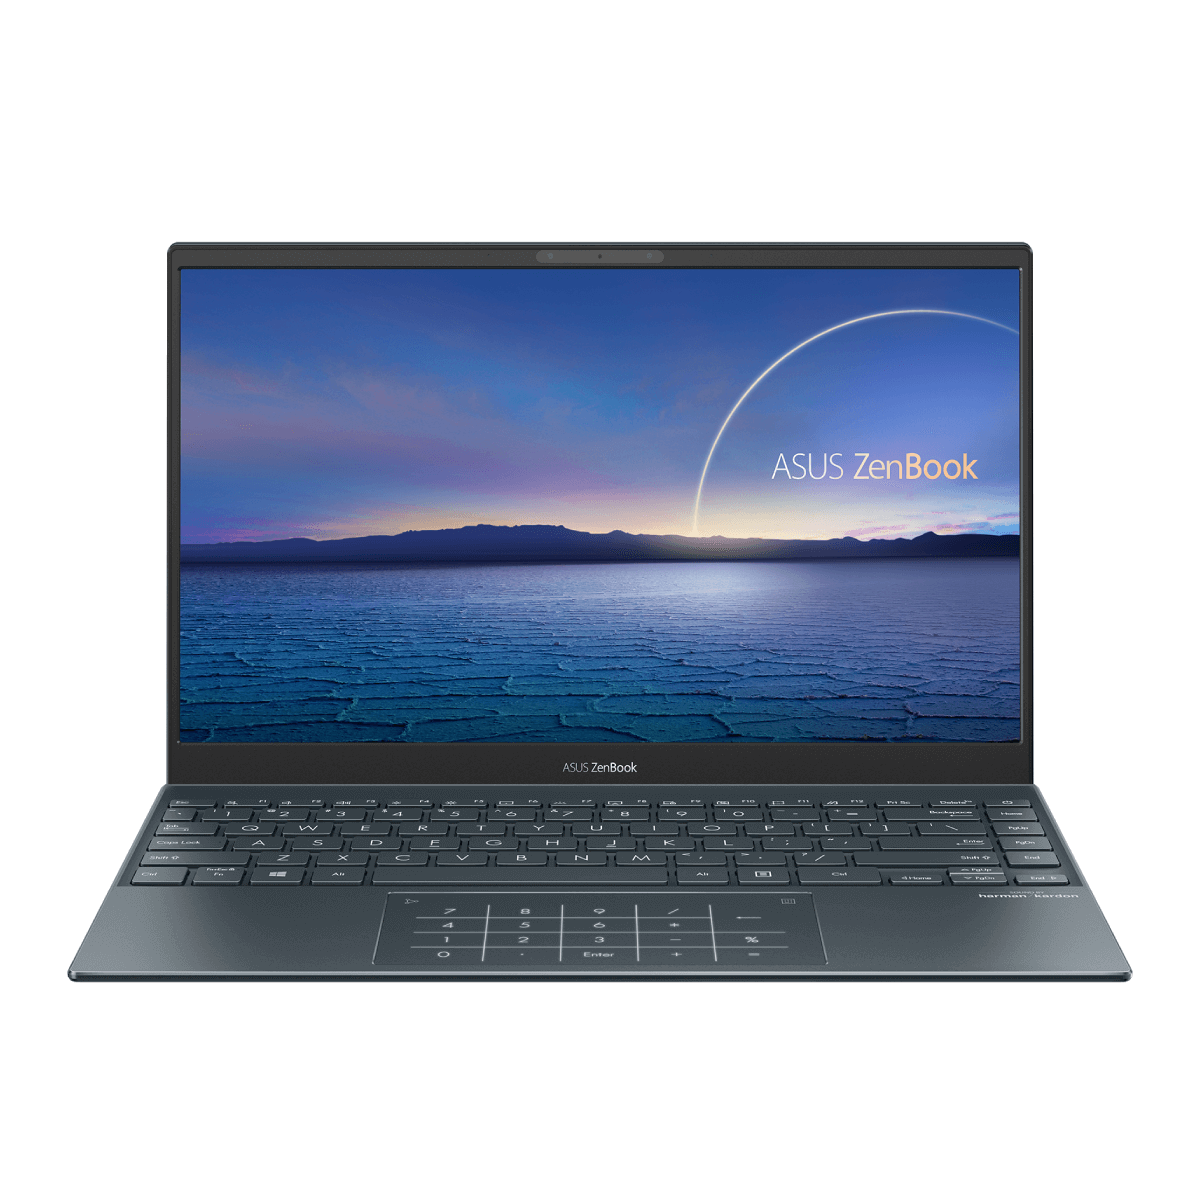 ASUS ZenBook 13 (i7, Pine Grey)